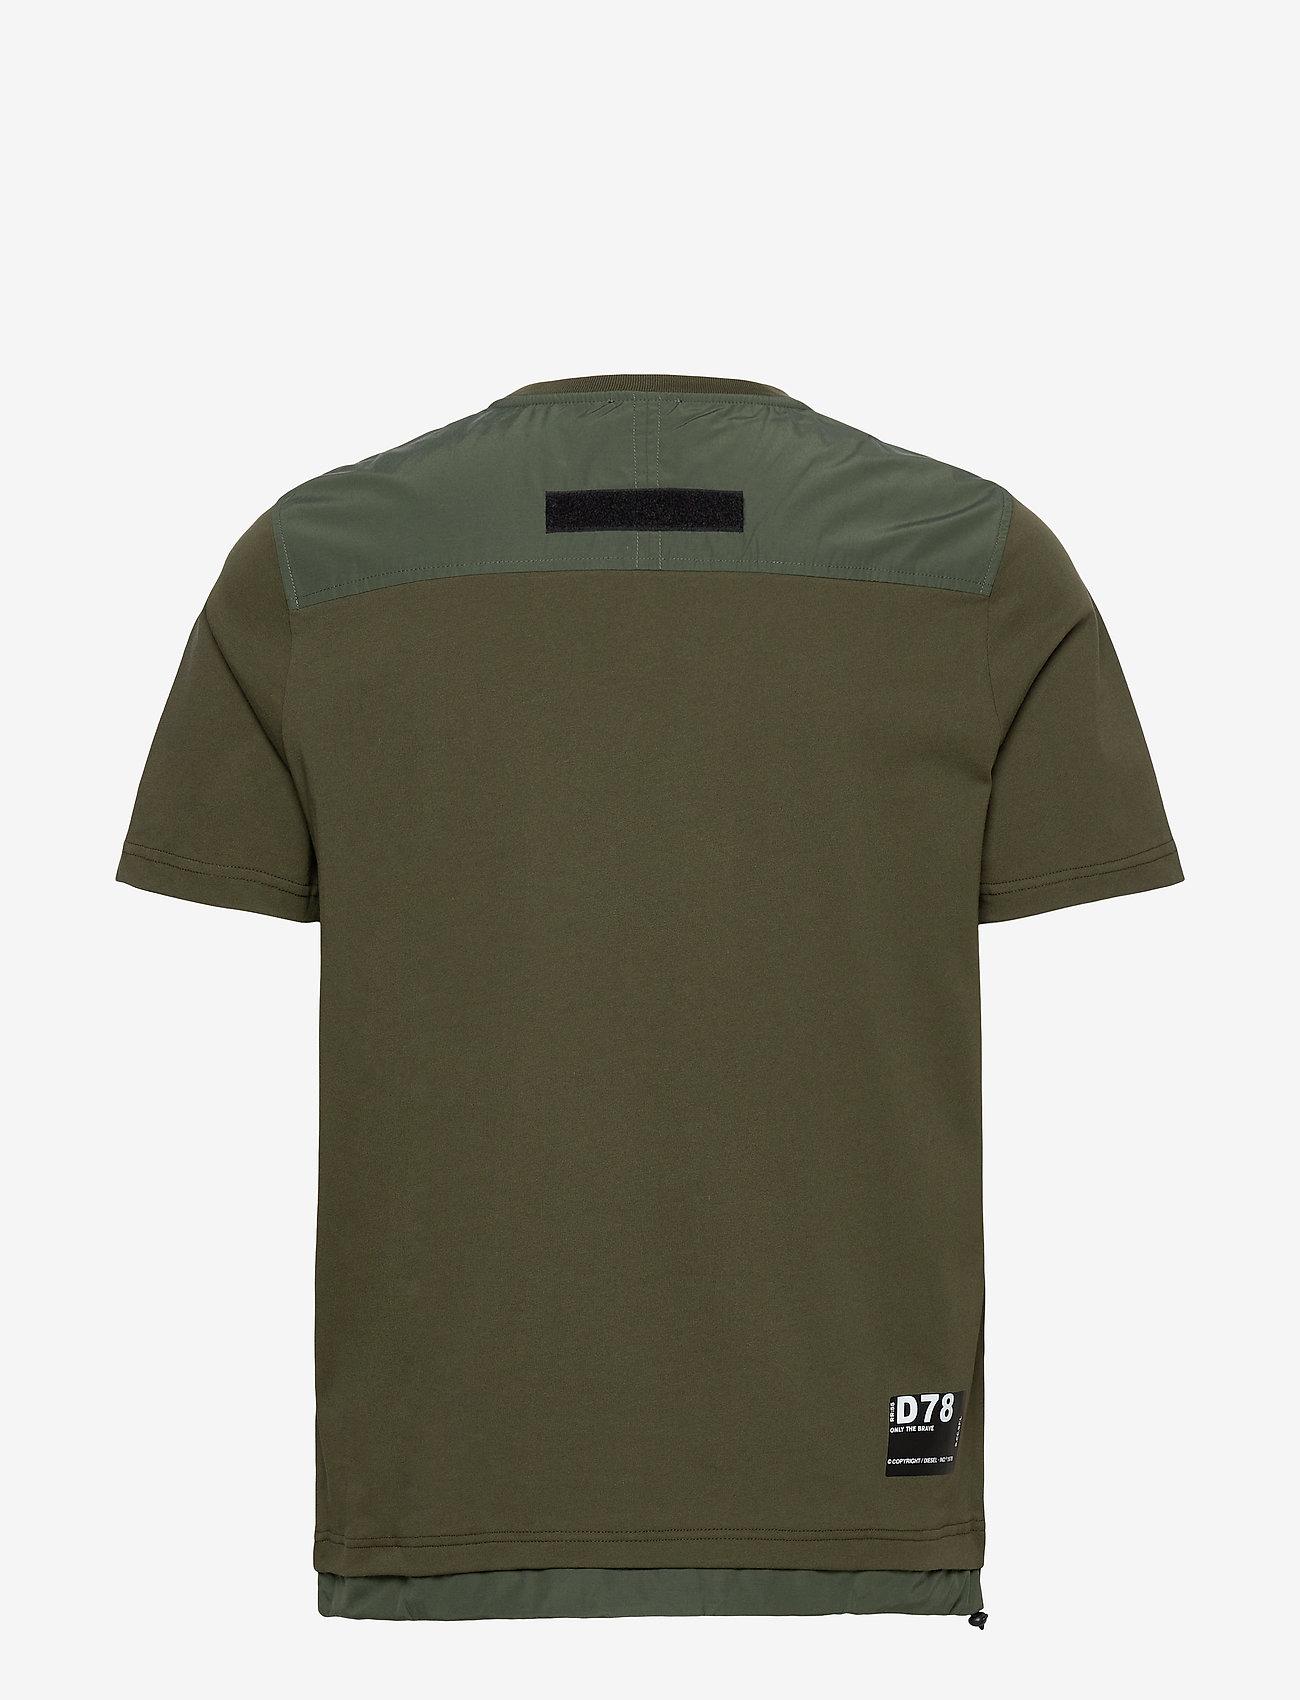 Diesel Men - T-ARMI T-SHIRT - basic t-shirts - green - 1